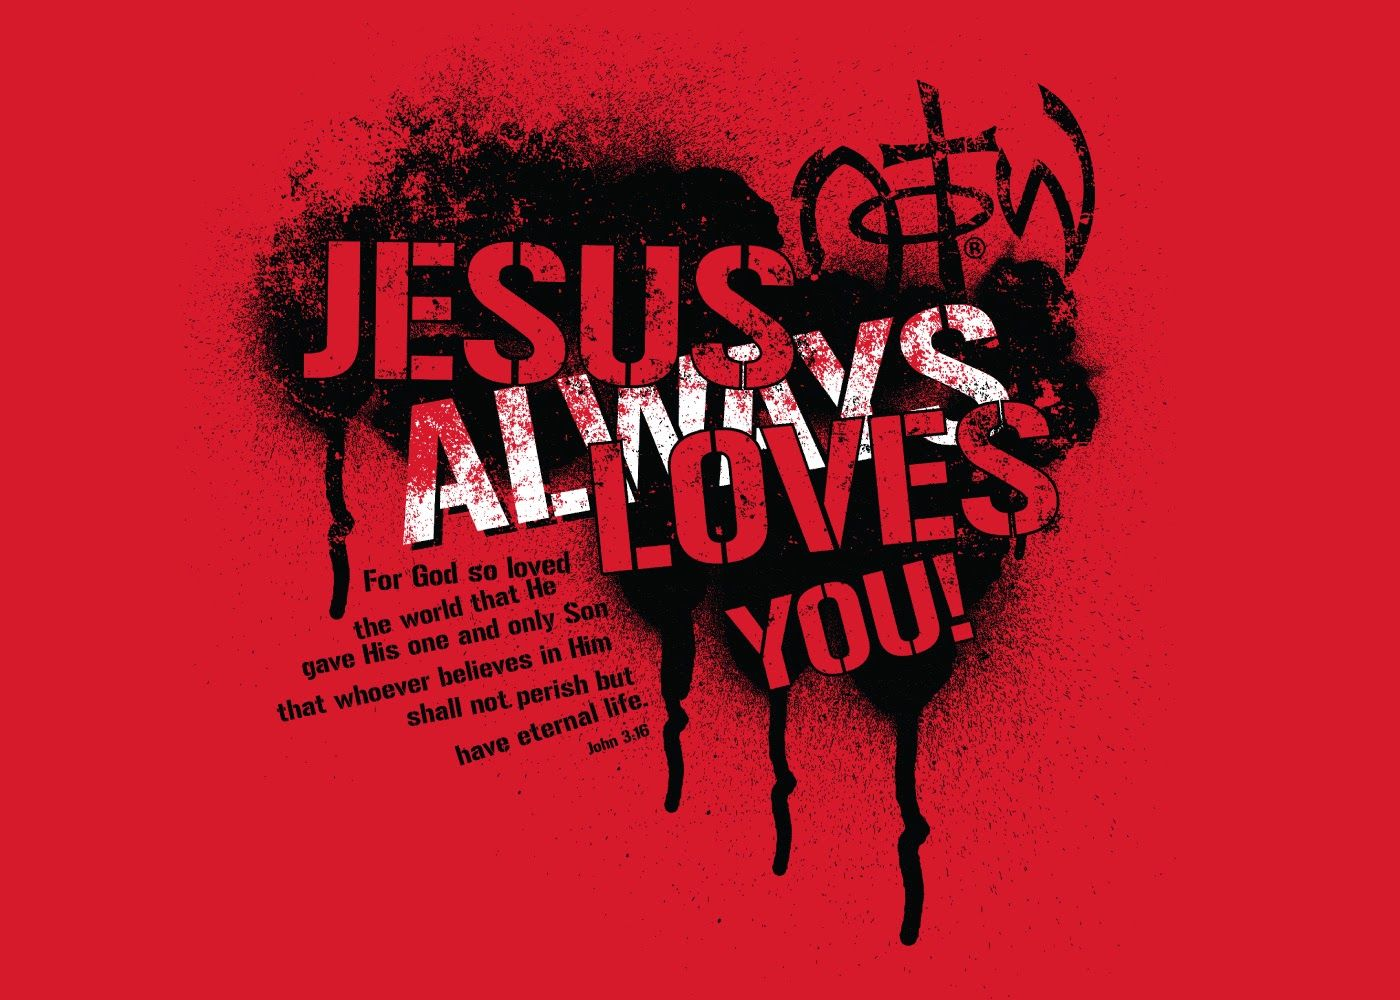 Jesus My Valentine Greetings Christian Love Quotes Jesus Loves True Quotes